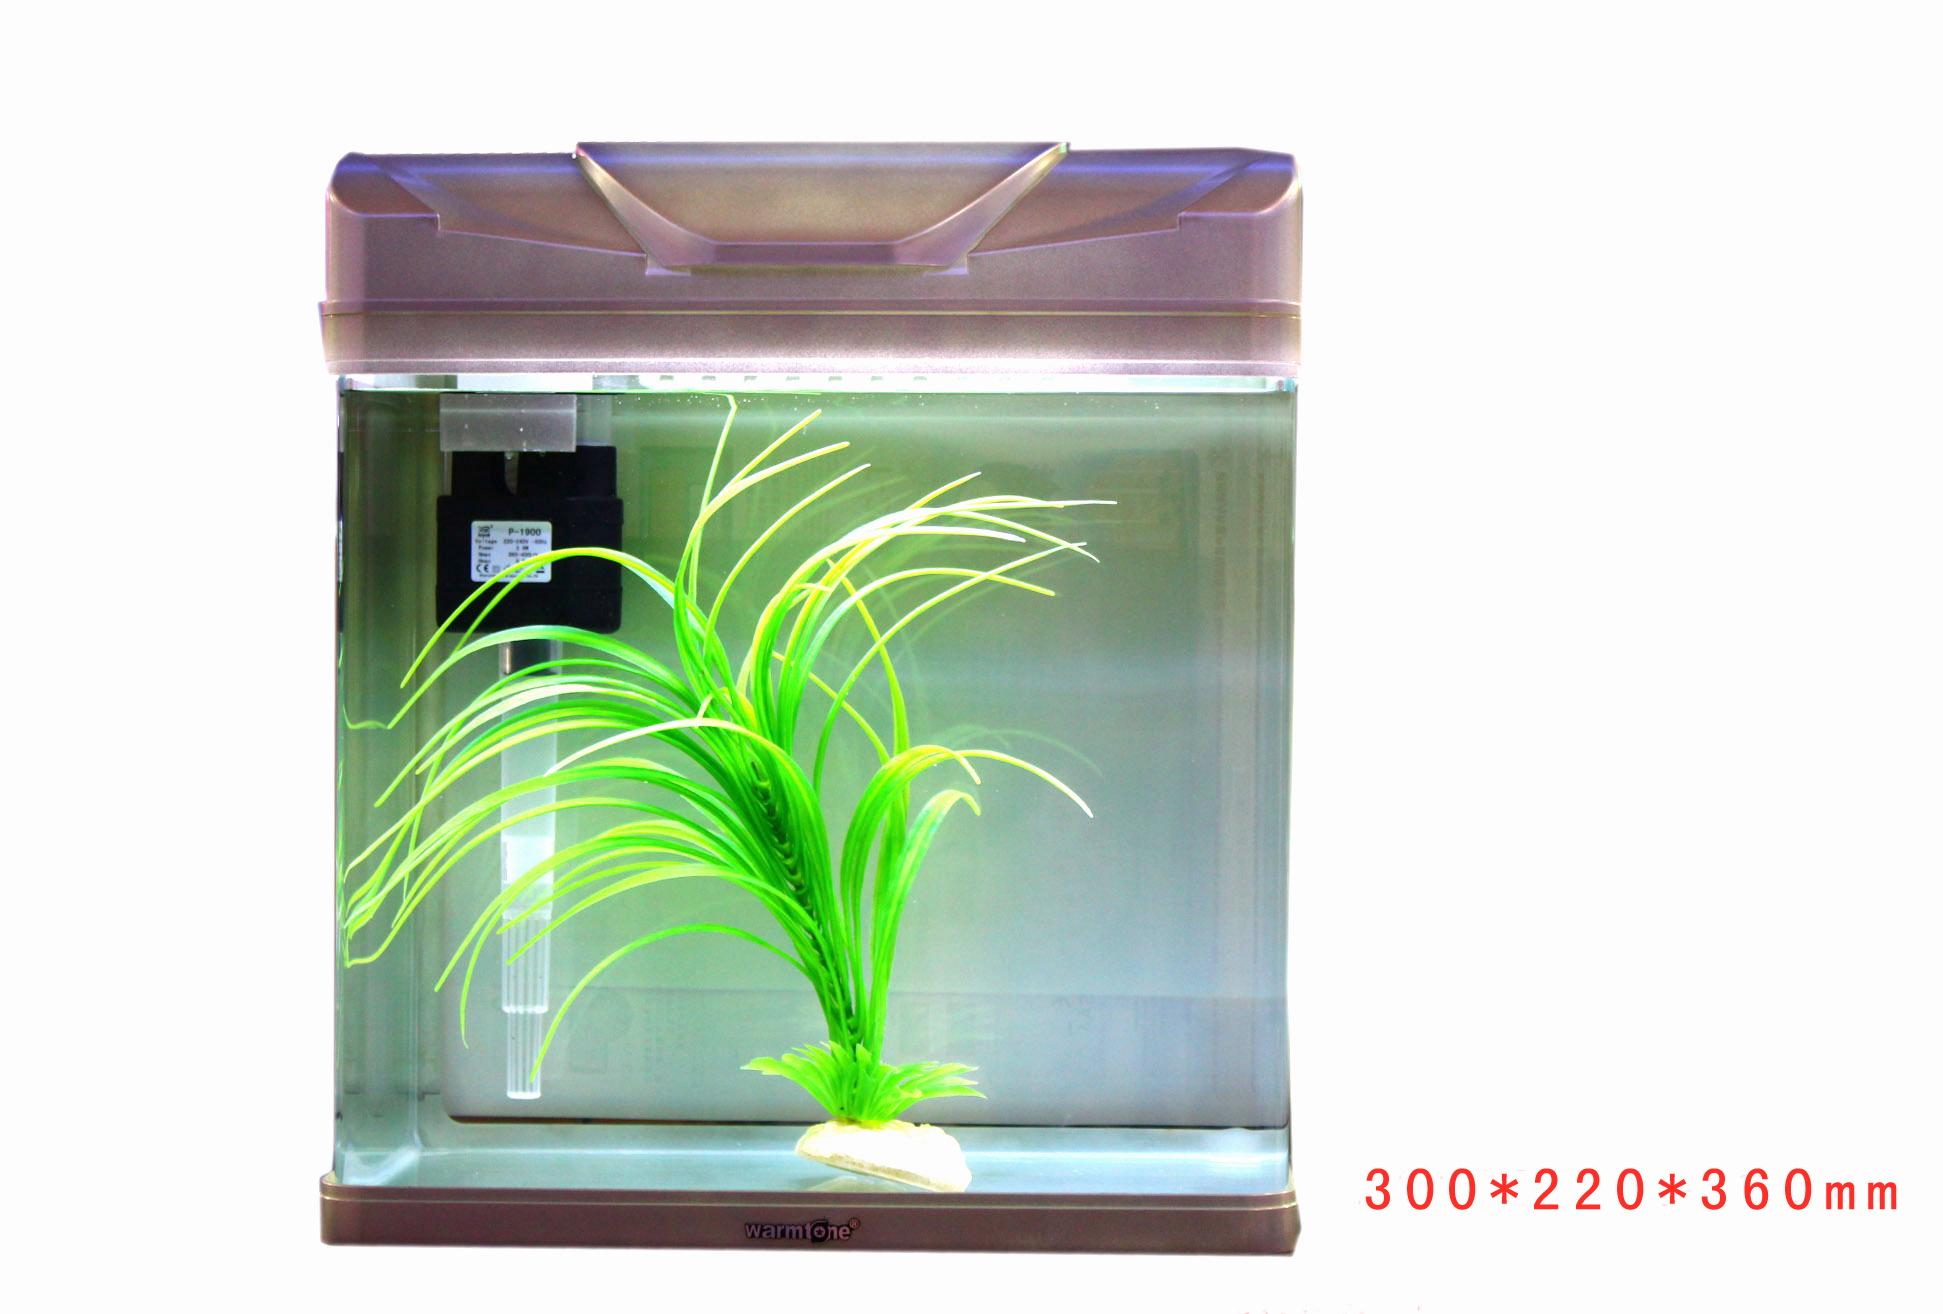 Aquarium fish tank china - Wt30 Aquarium Led Fish Tank